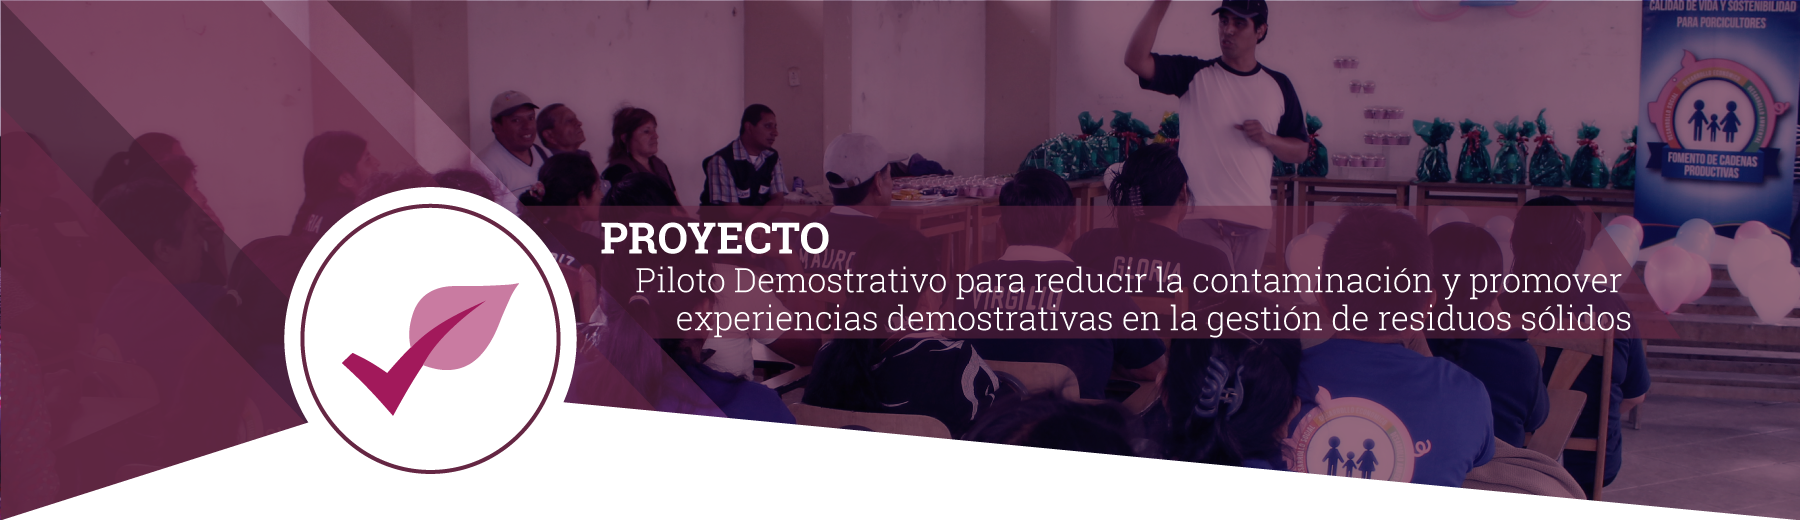 proyecto4-2